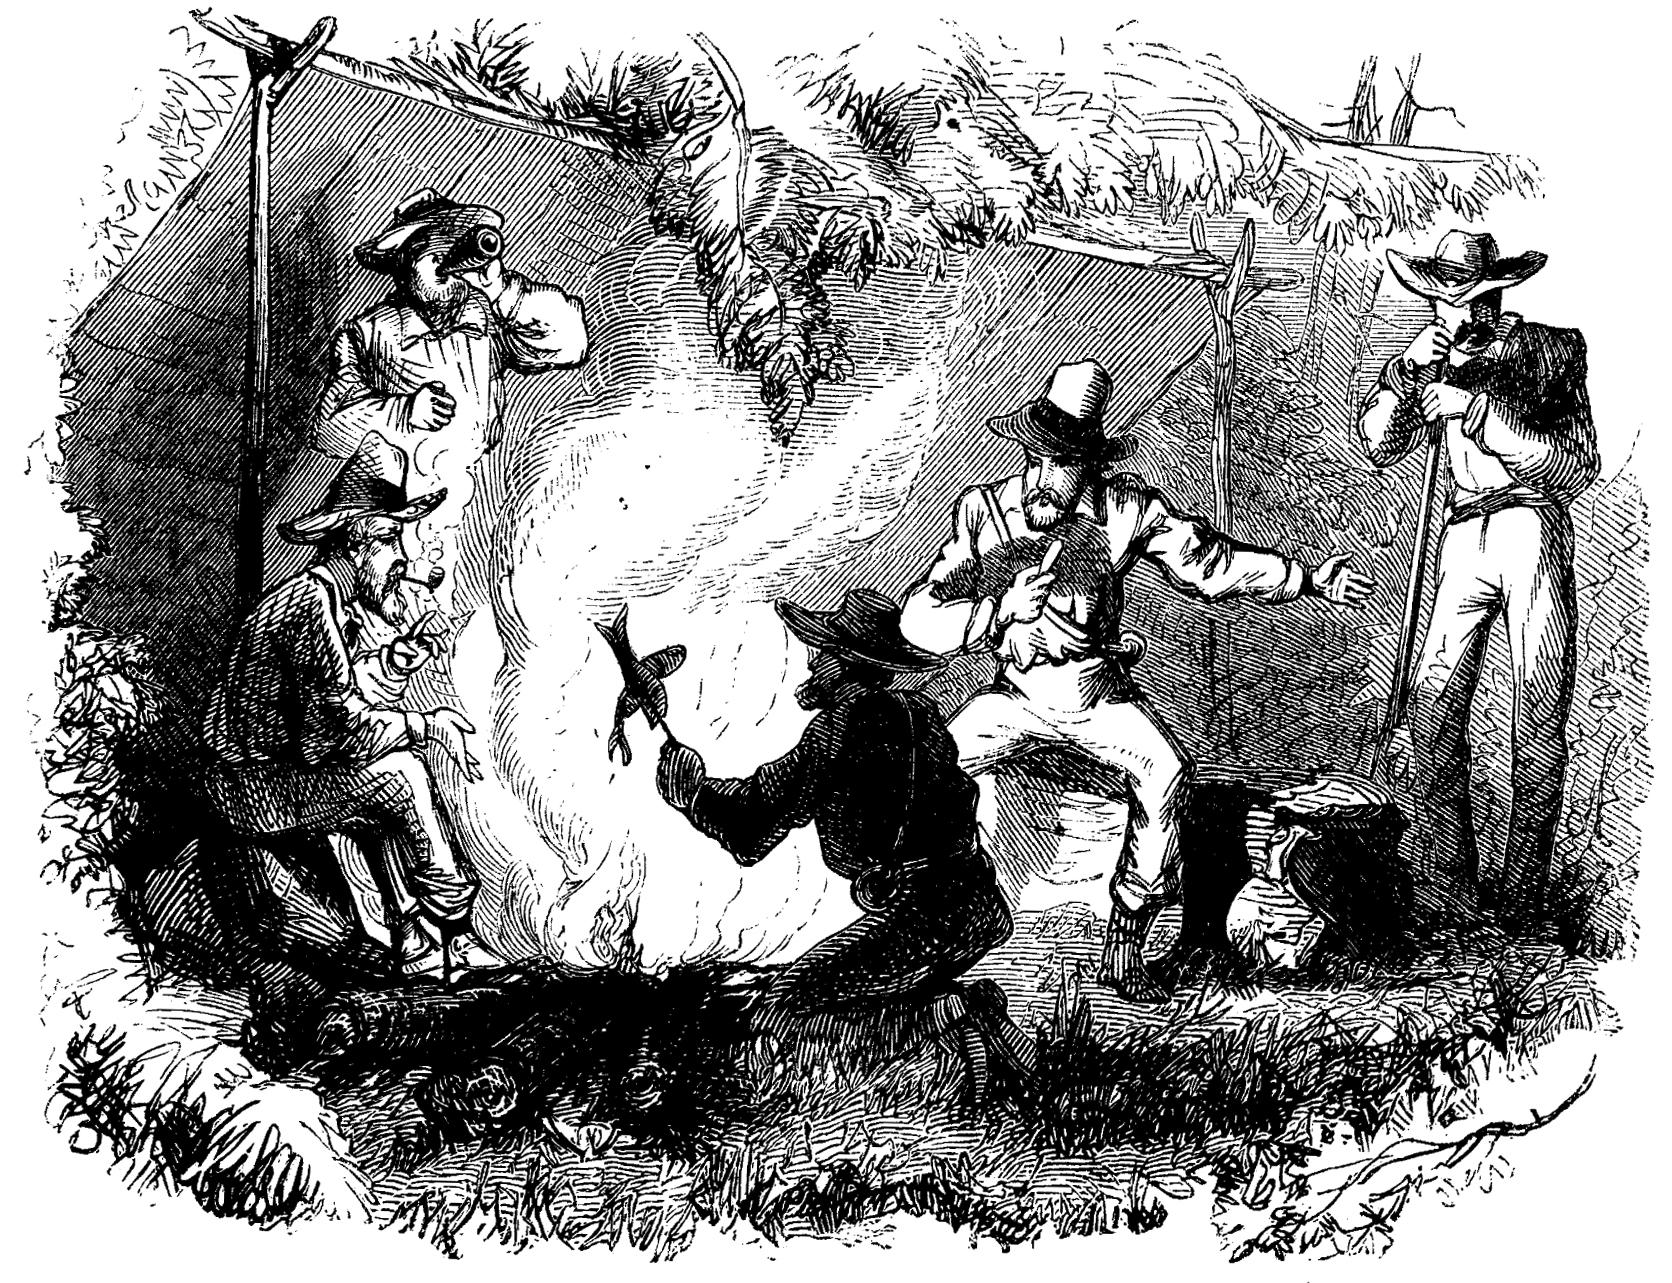 Harper's New Monthly Magazine, February 1860